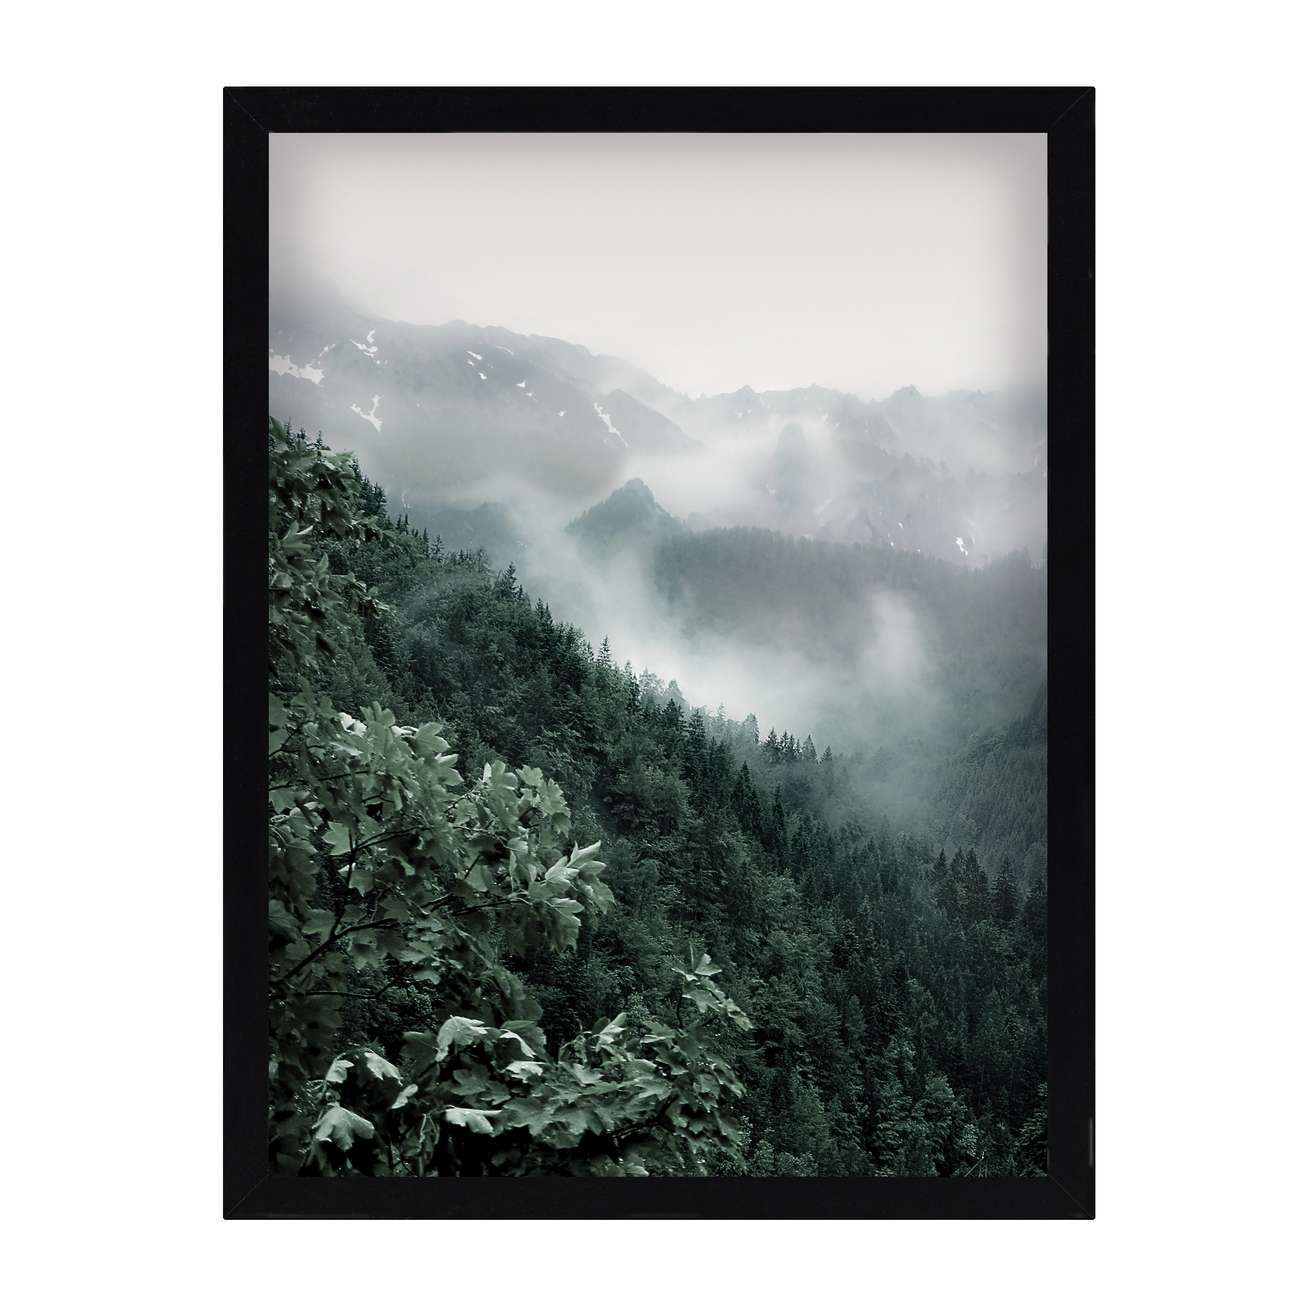 Wandbild Green Hills I 30x40cm, 30 × 40 cm | Dekoration > Bilder und Rahmen | Green - Grün | Mdf | Dekoria